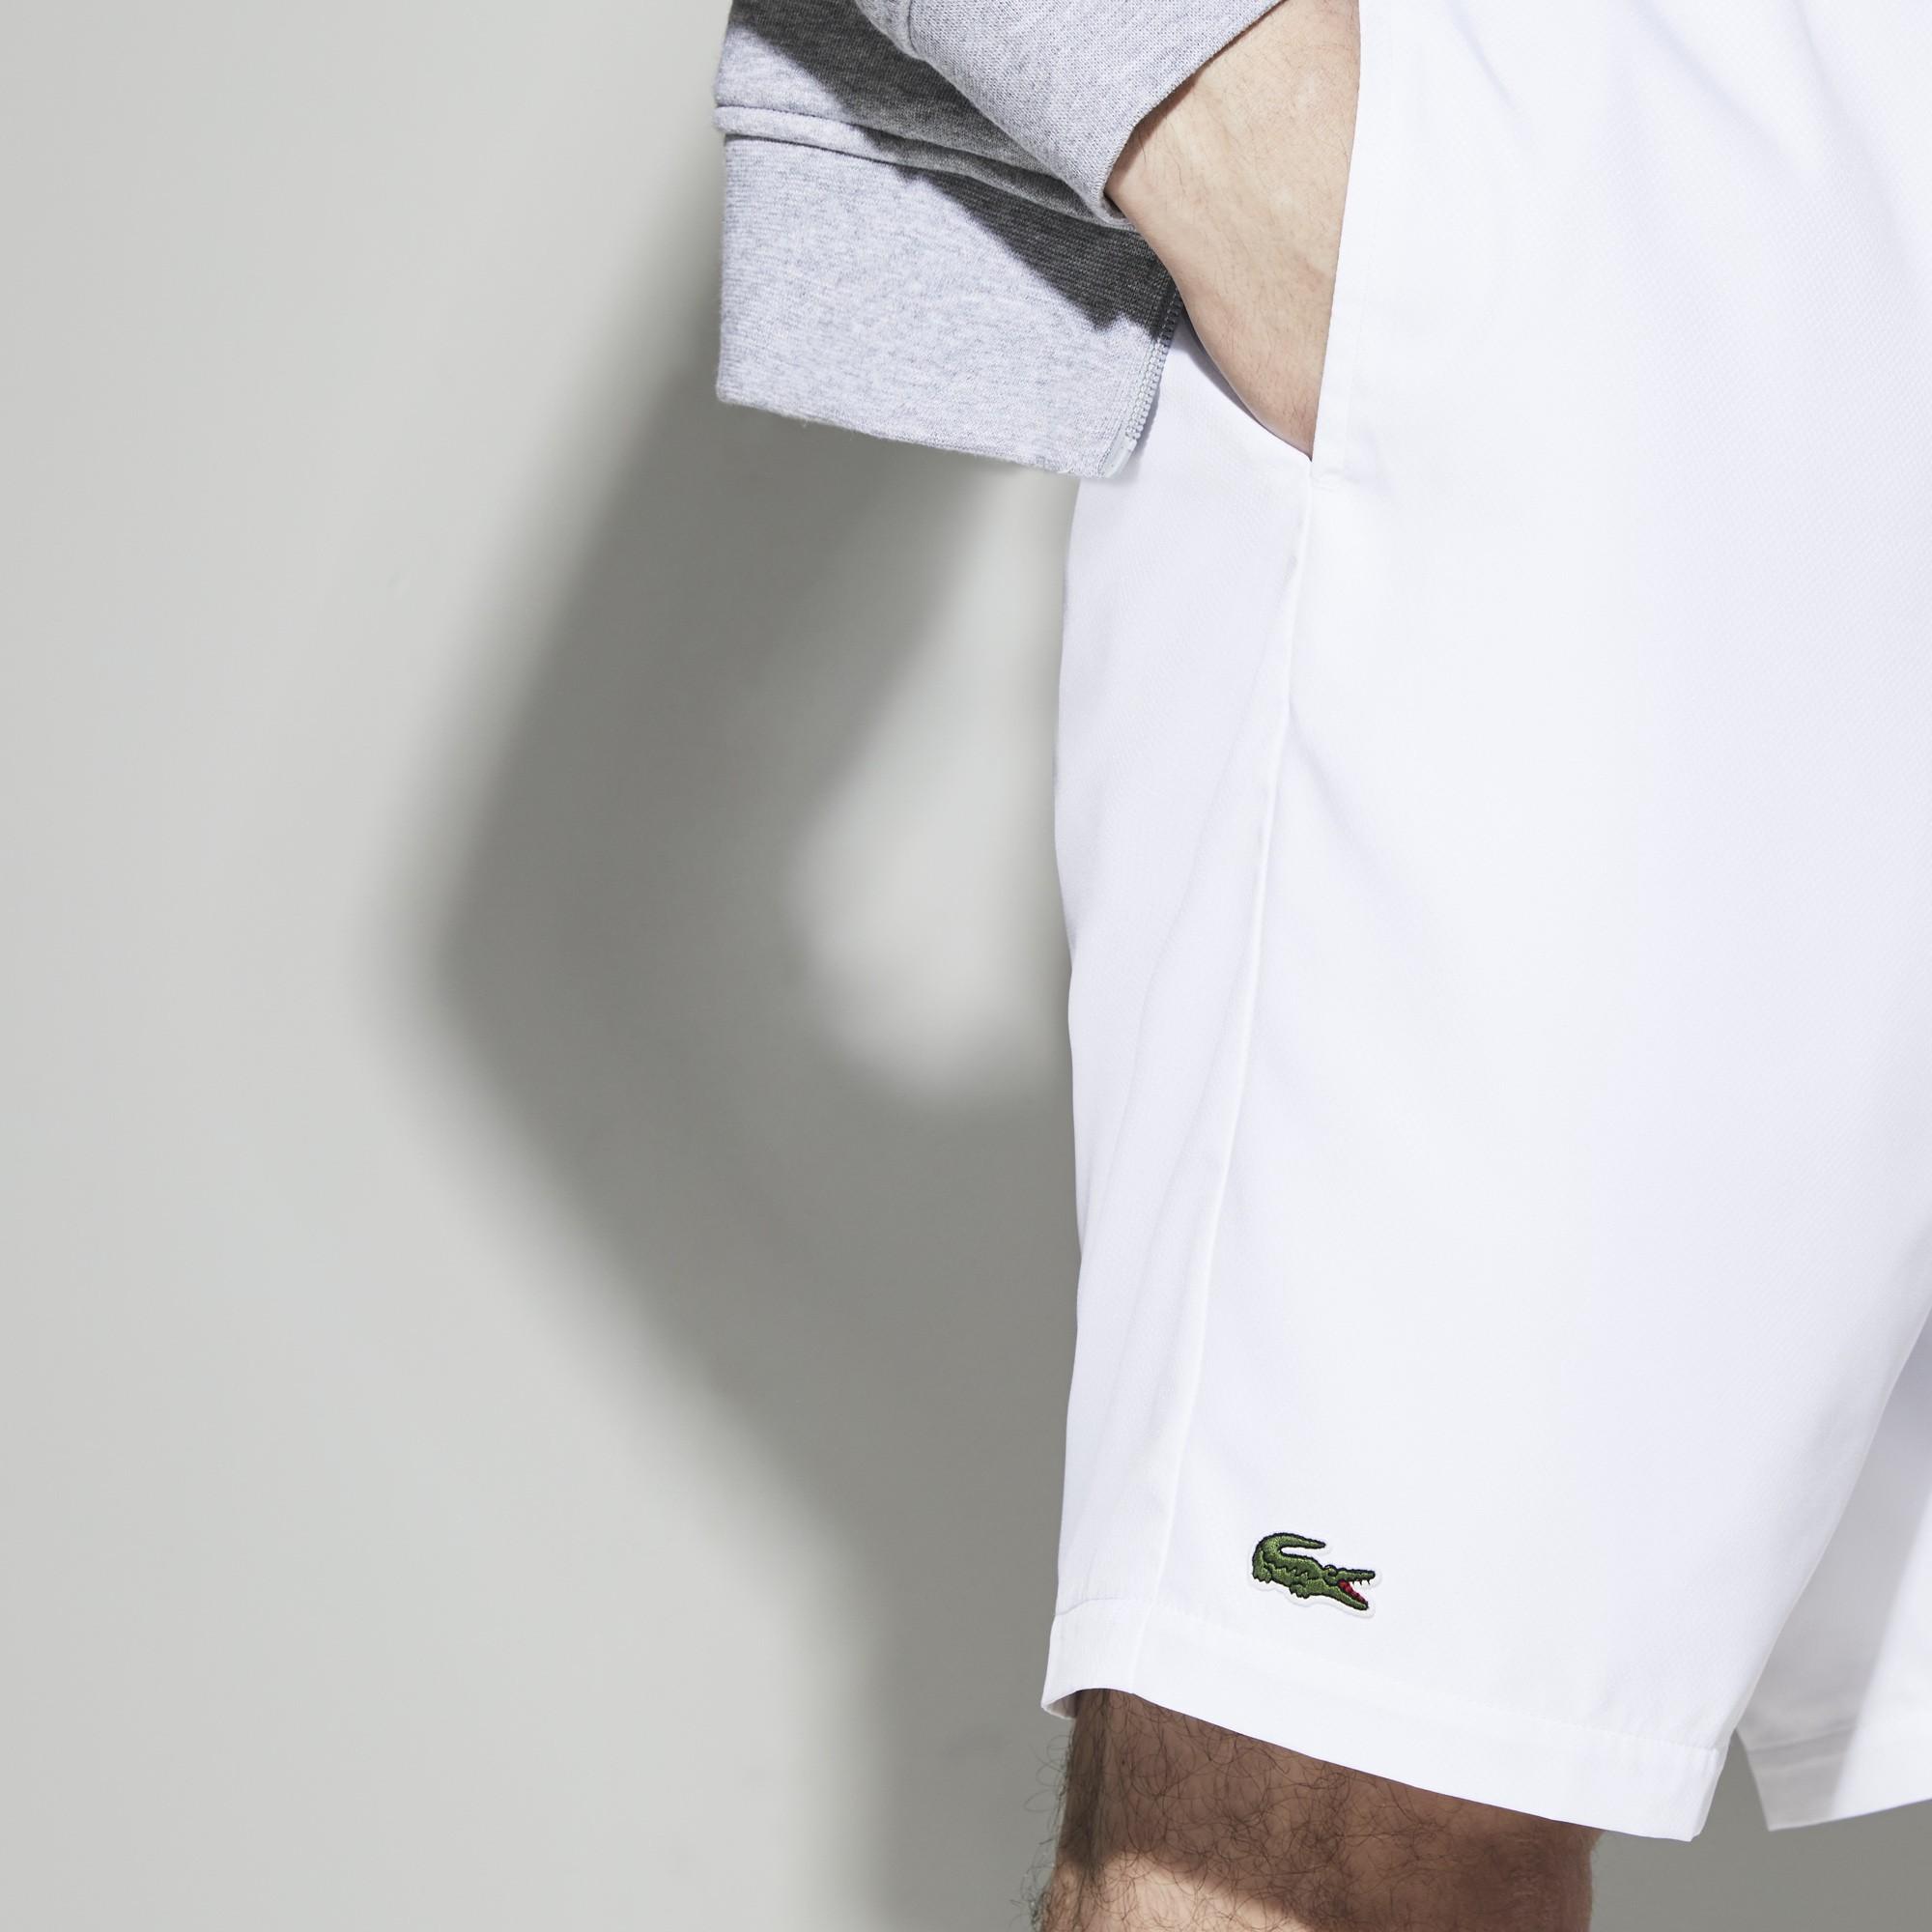 f38d09b958c04 Lacoste Men s Sport Tennis Shorts In Solid Diamond Weave Taffeta - Graphite  Grey 5 Green